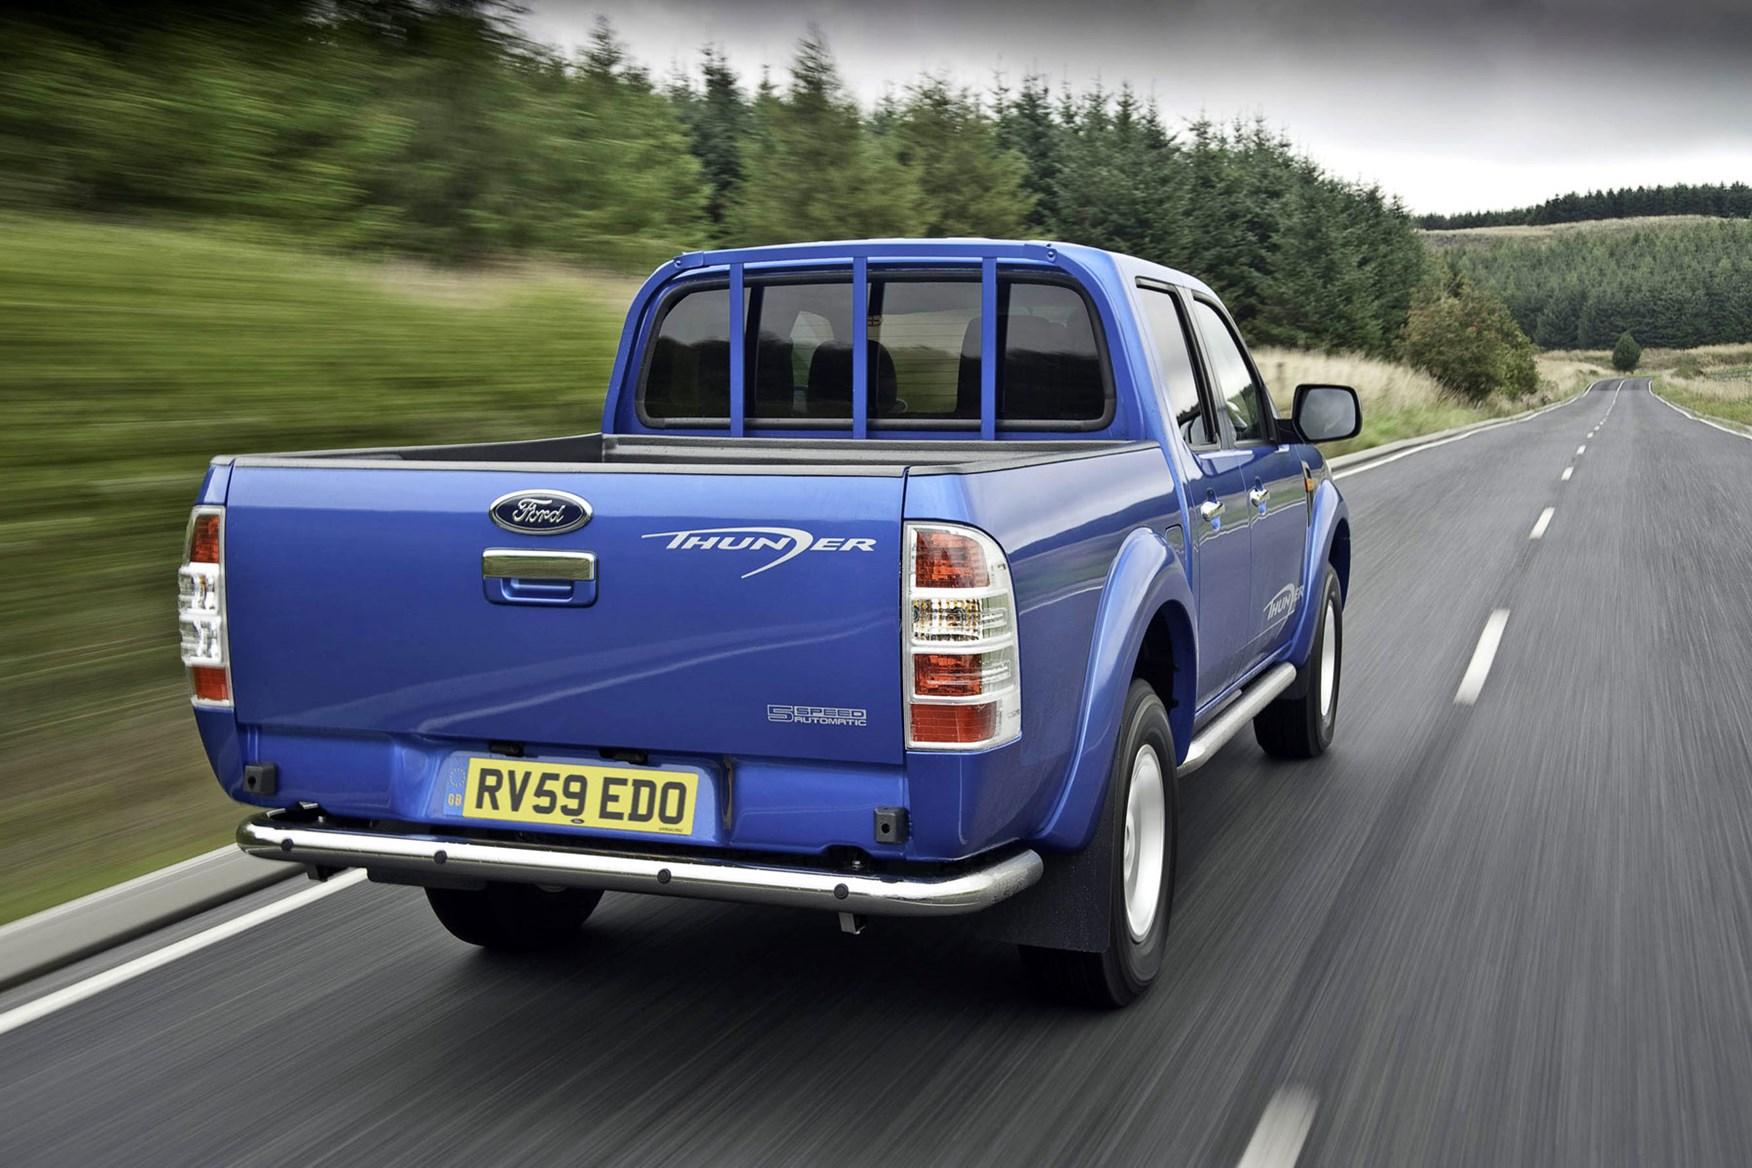 Ford Ranger (2006-2011) driving rear